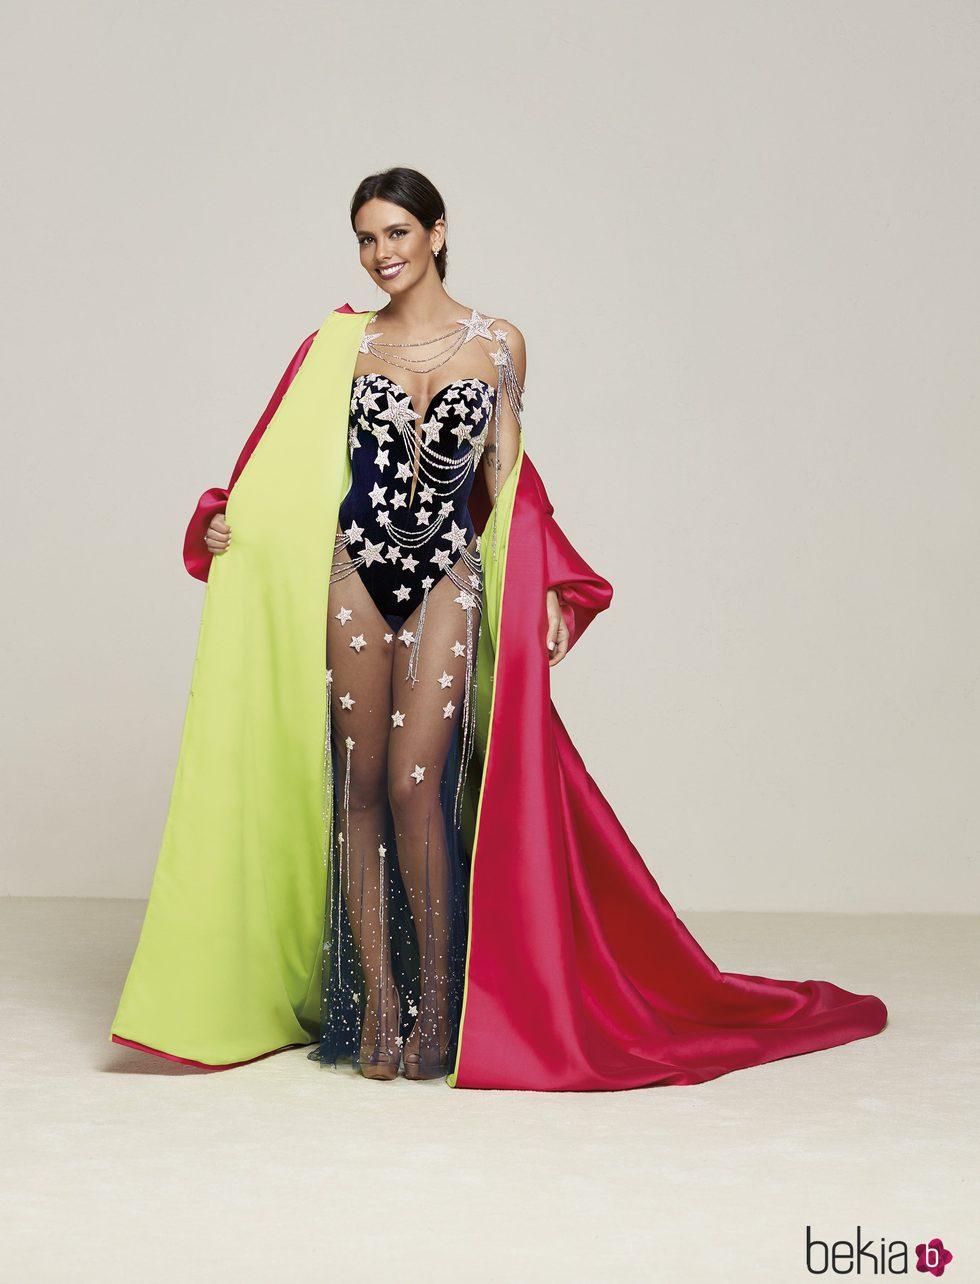 Cristina Pedroche descubre su espectacular vestido de Nochevieja 2016